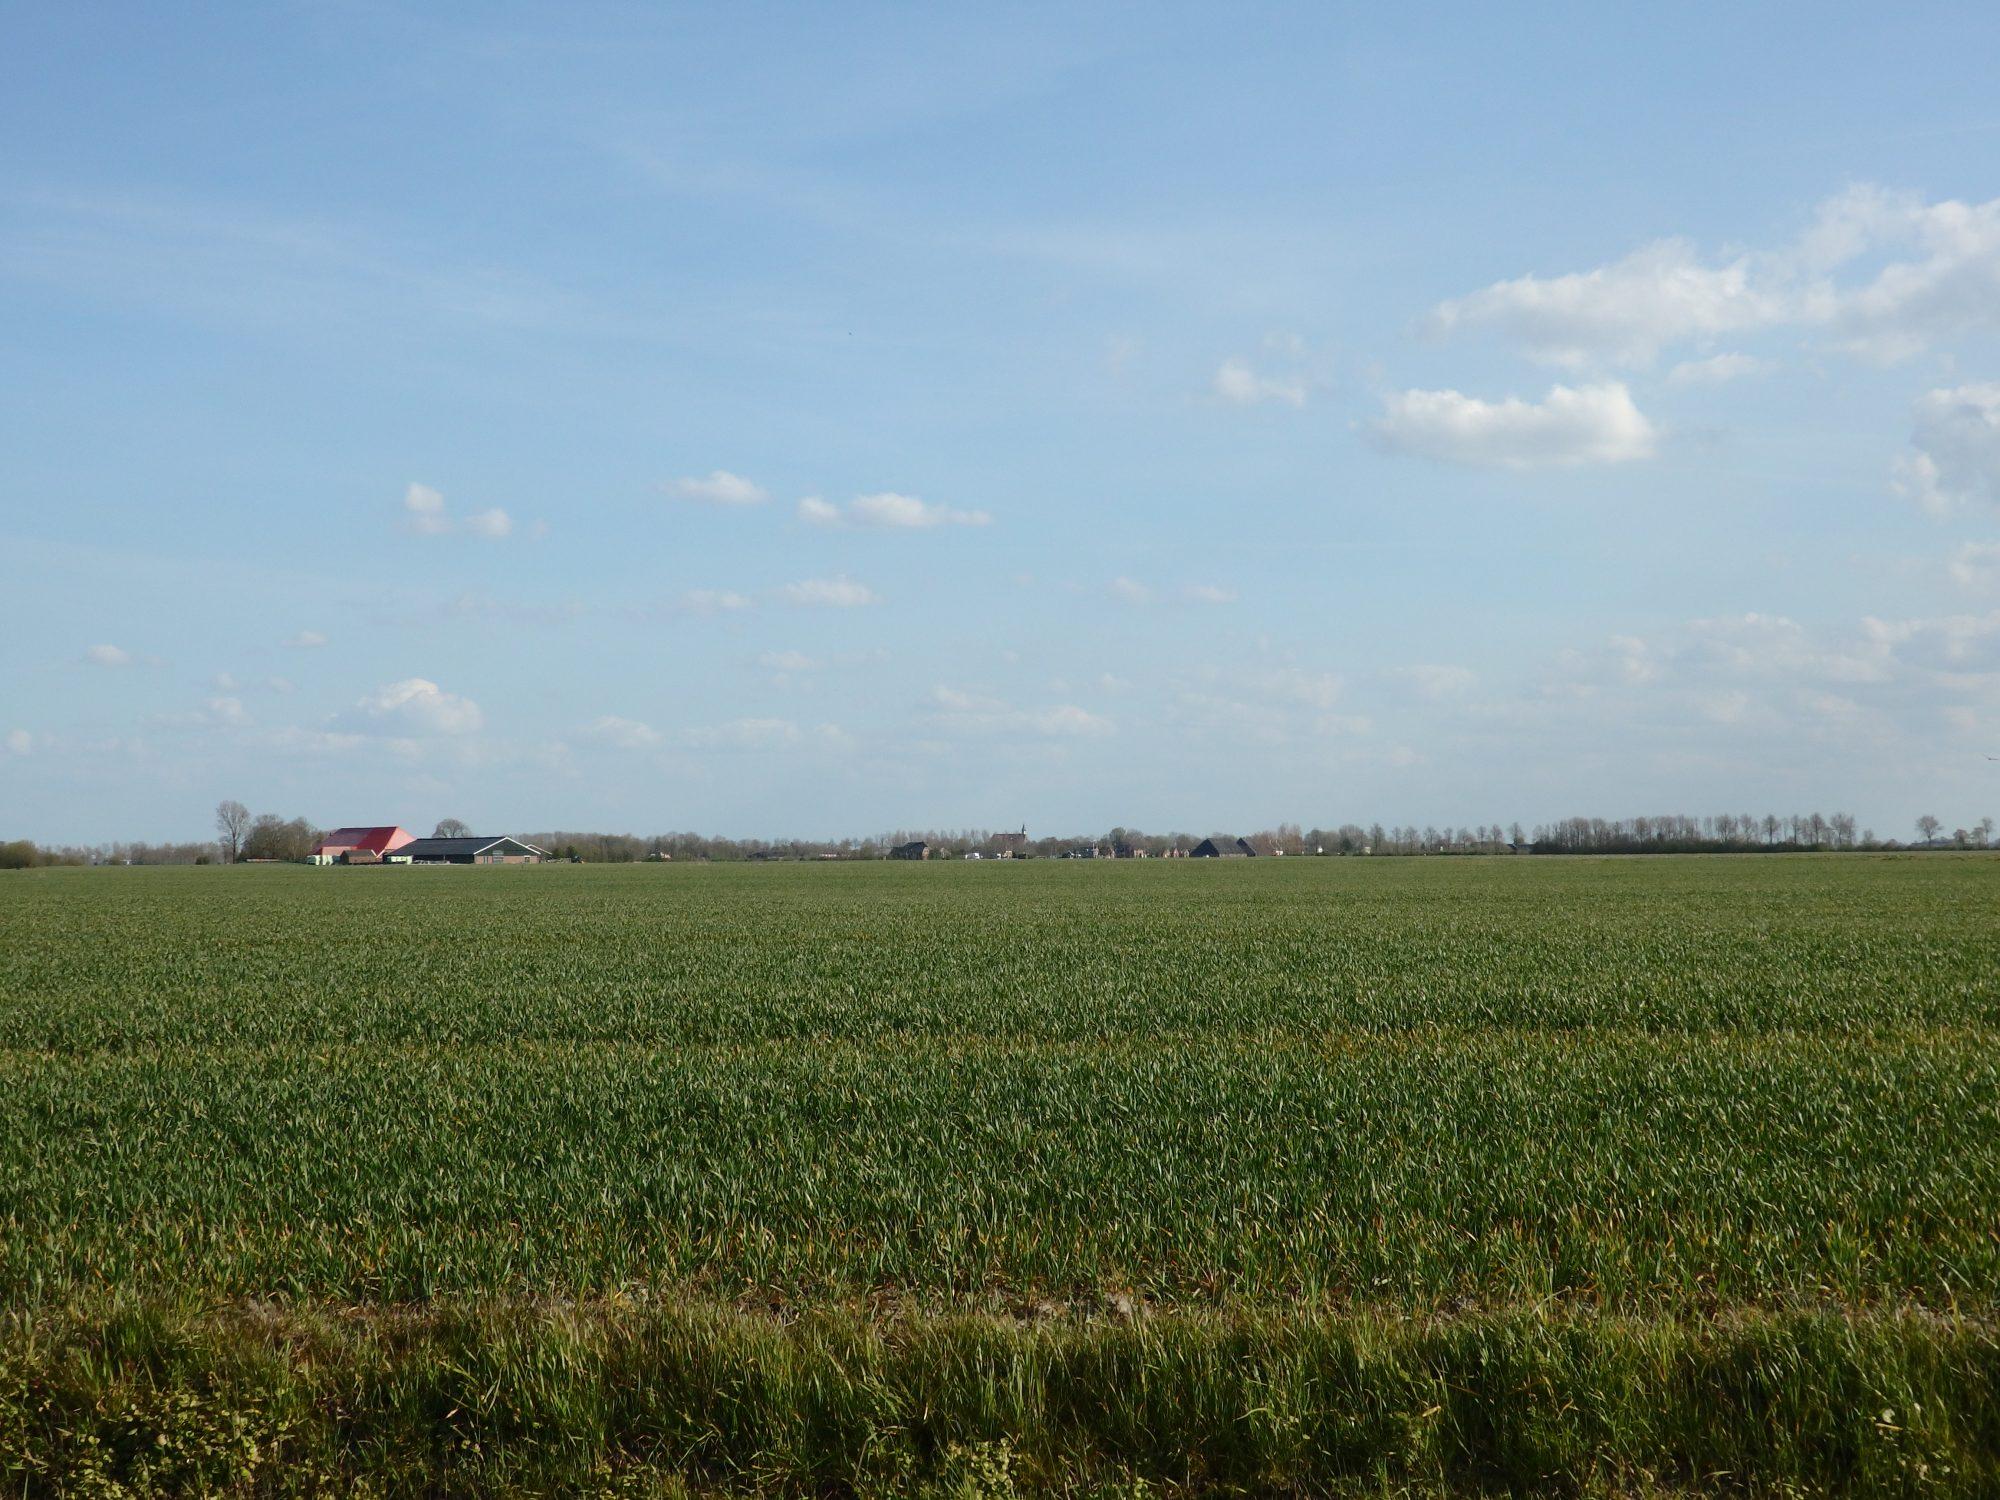 Big sky, flat land: typical Groningen province scenery